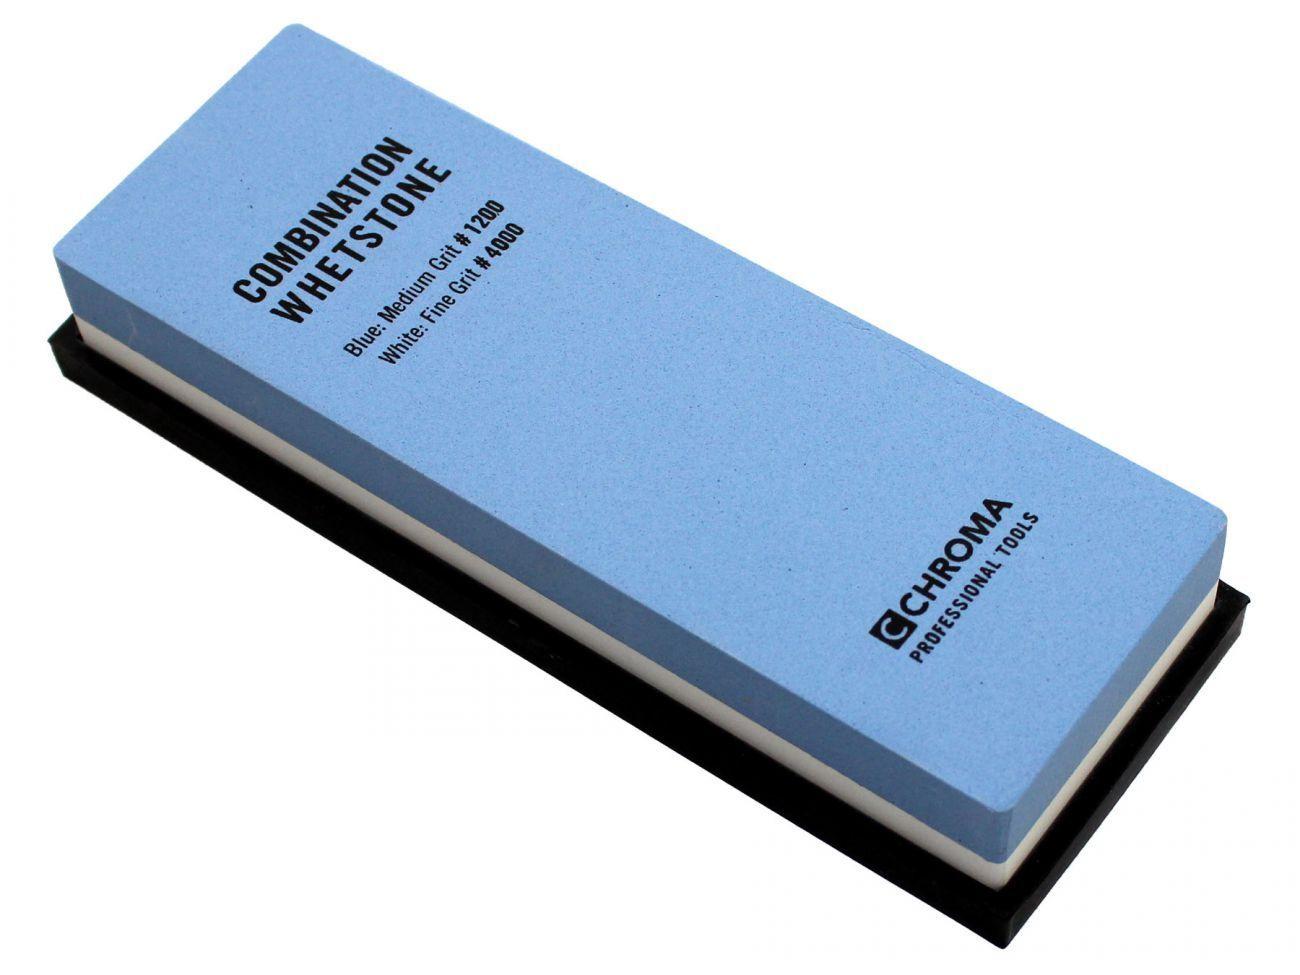 Chroma st-12 4 MEULE AFFUTAGE GRAIN 1200 4000